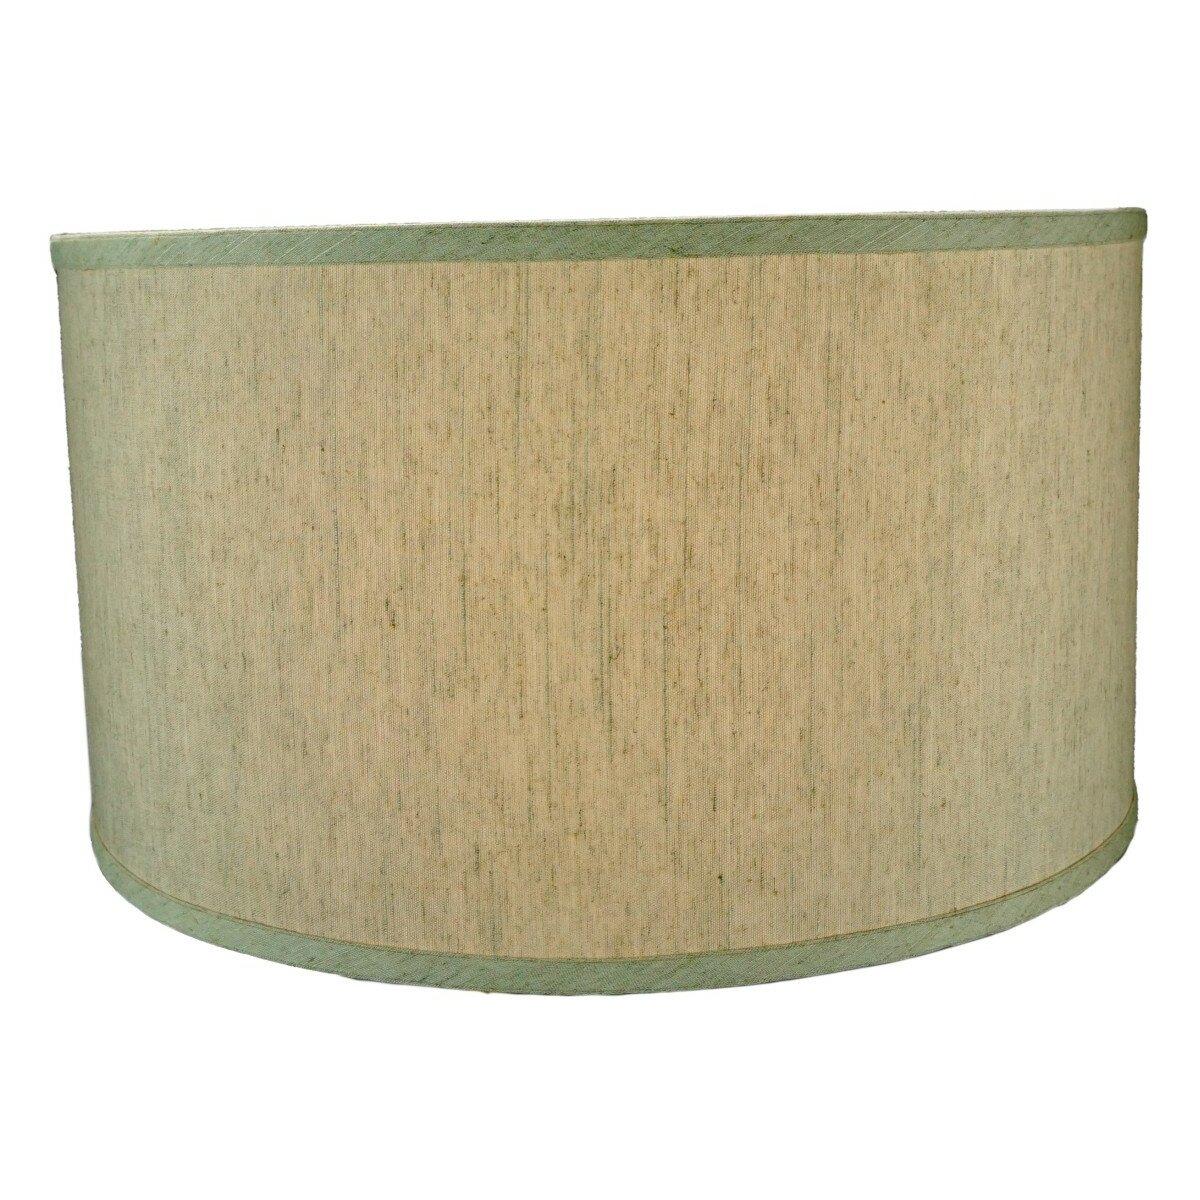 home concept 18 shallow burlap drum lamp shade reviews. Black Bedroom Furniture Sets. Home Design Ideas